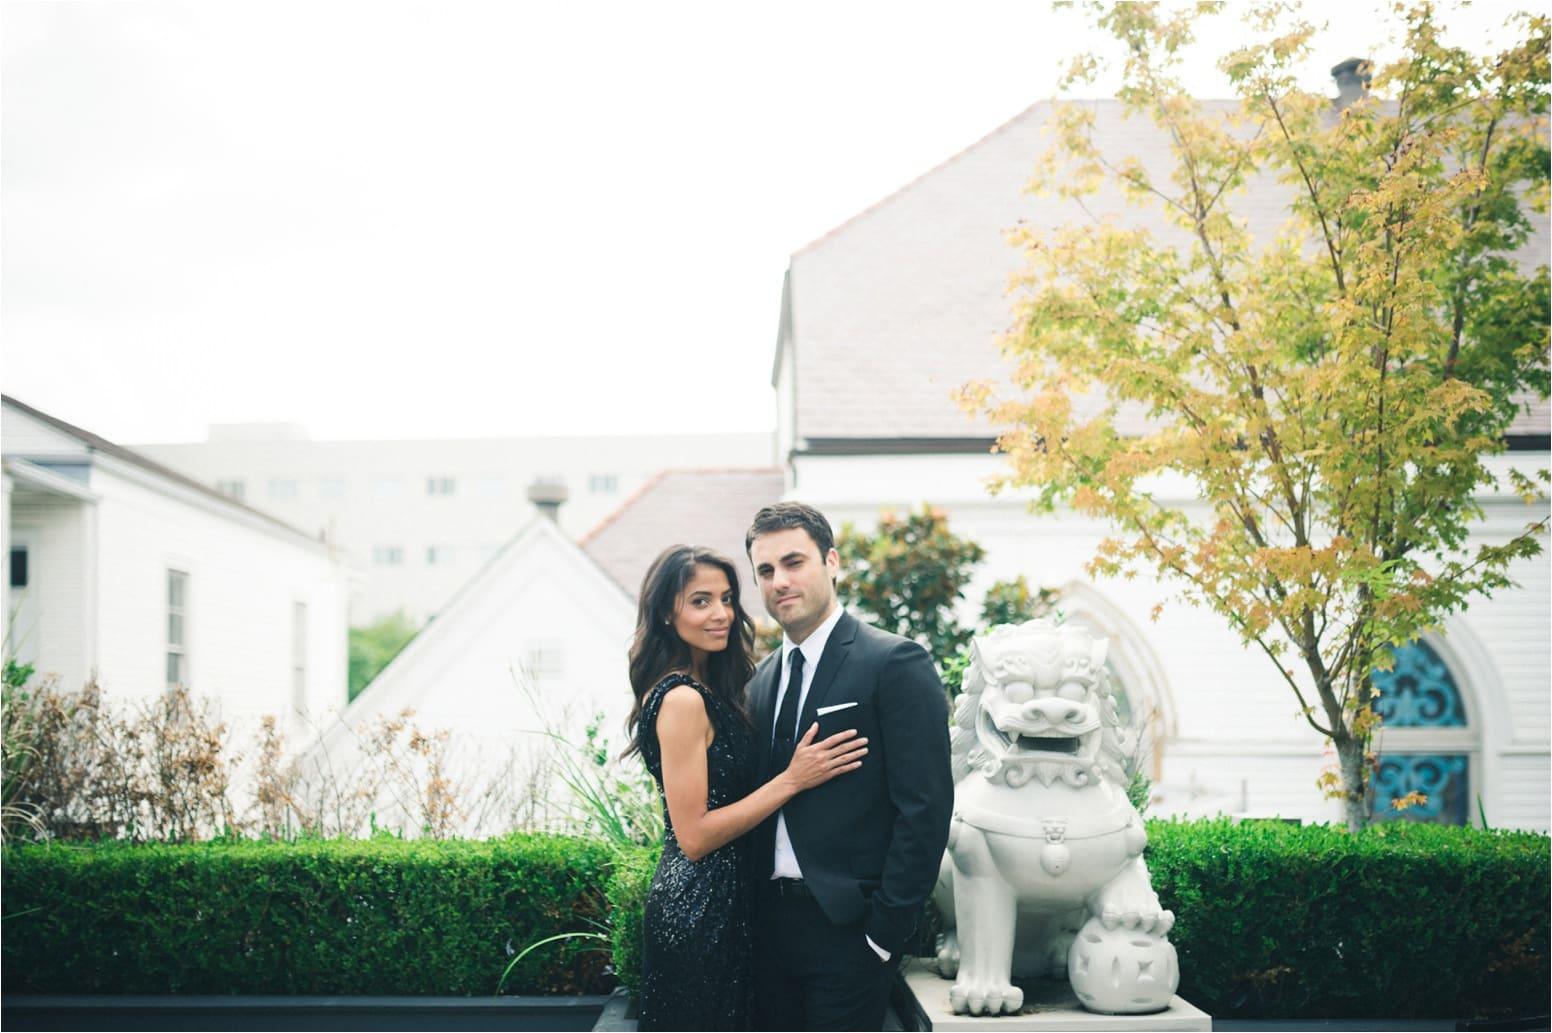 new orleans wedding photographer11